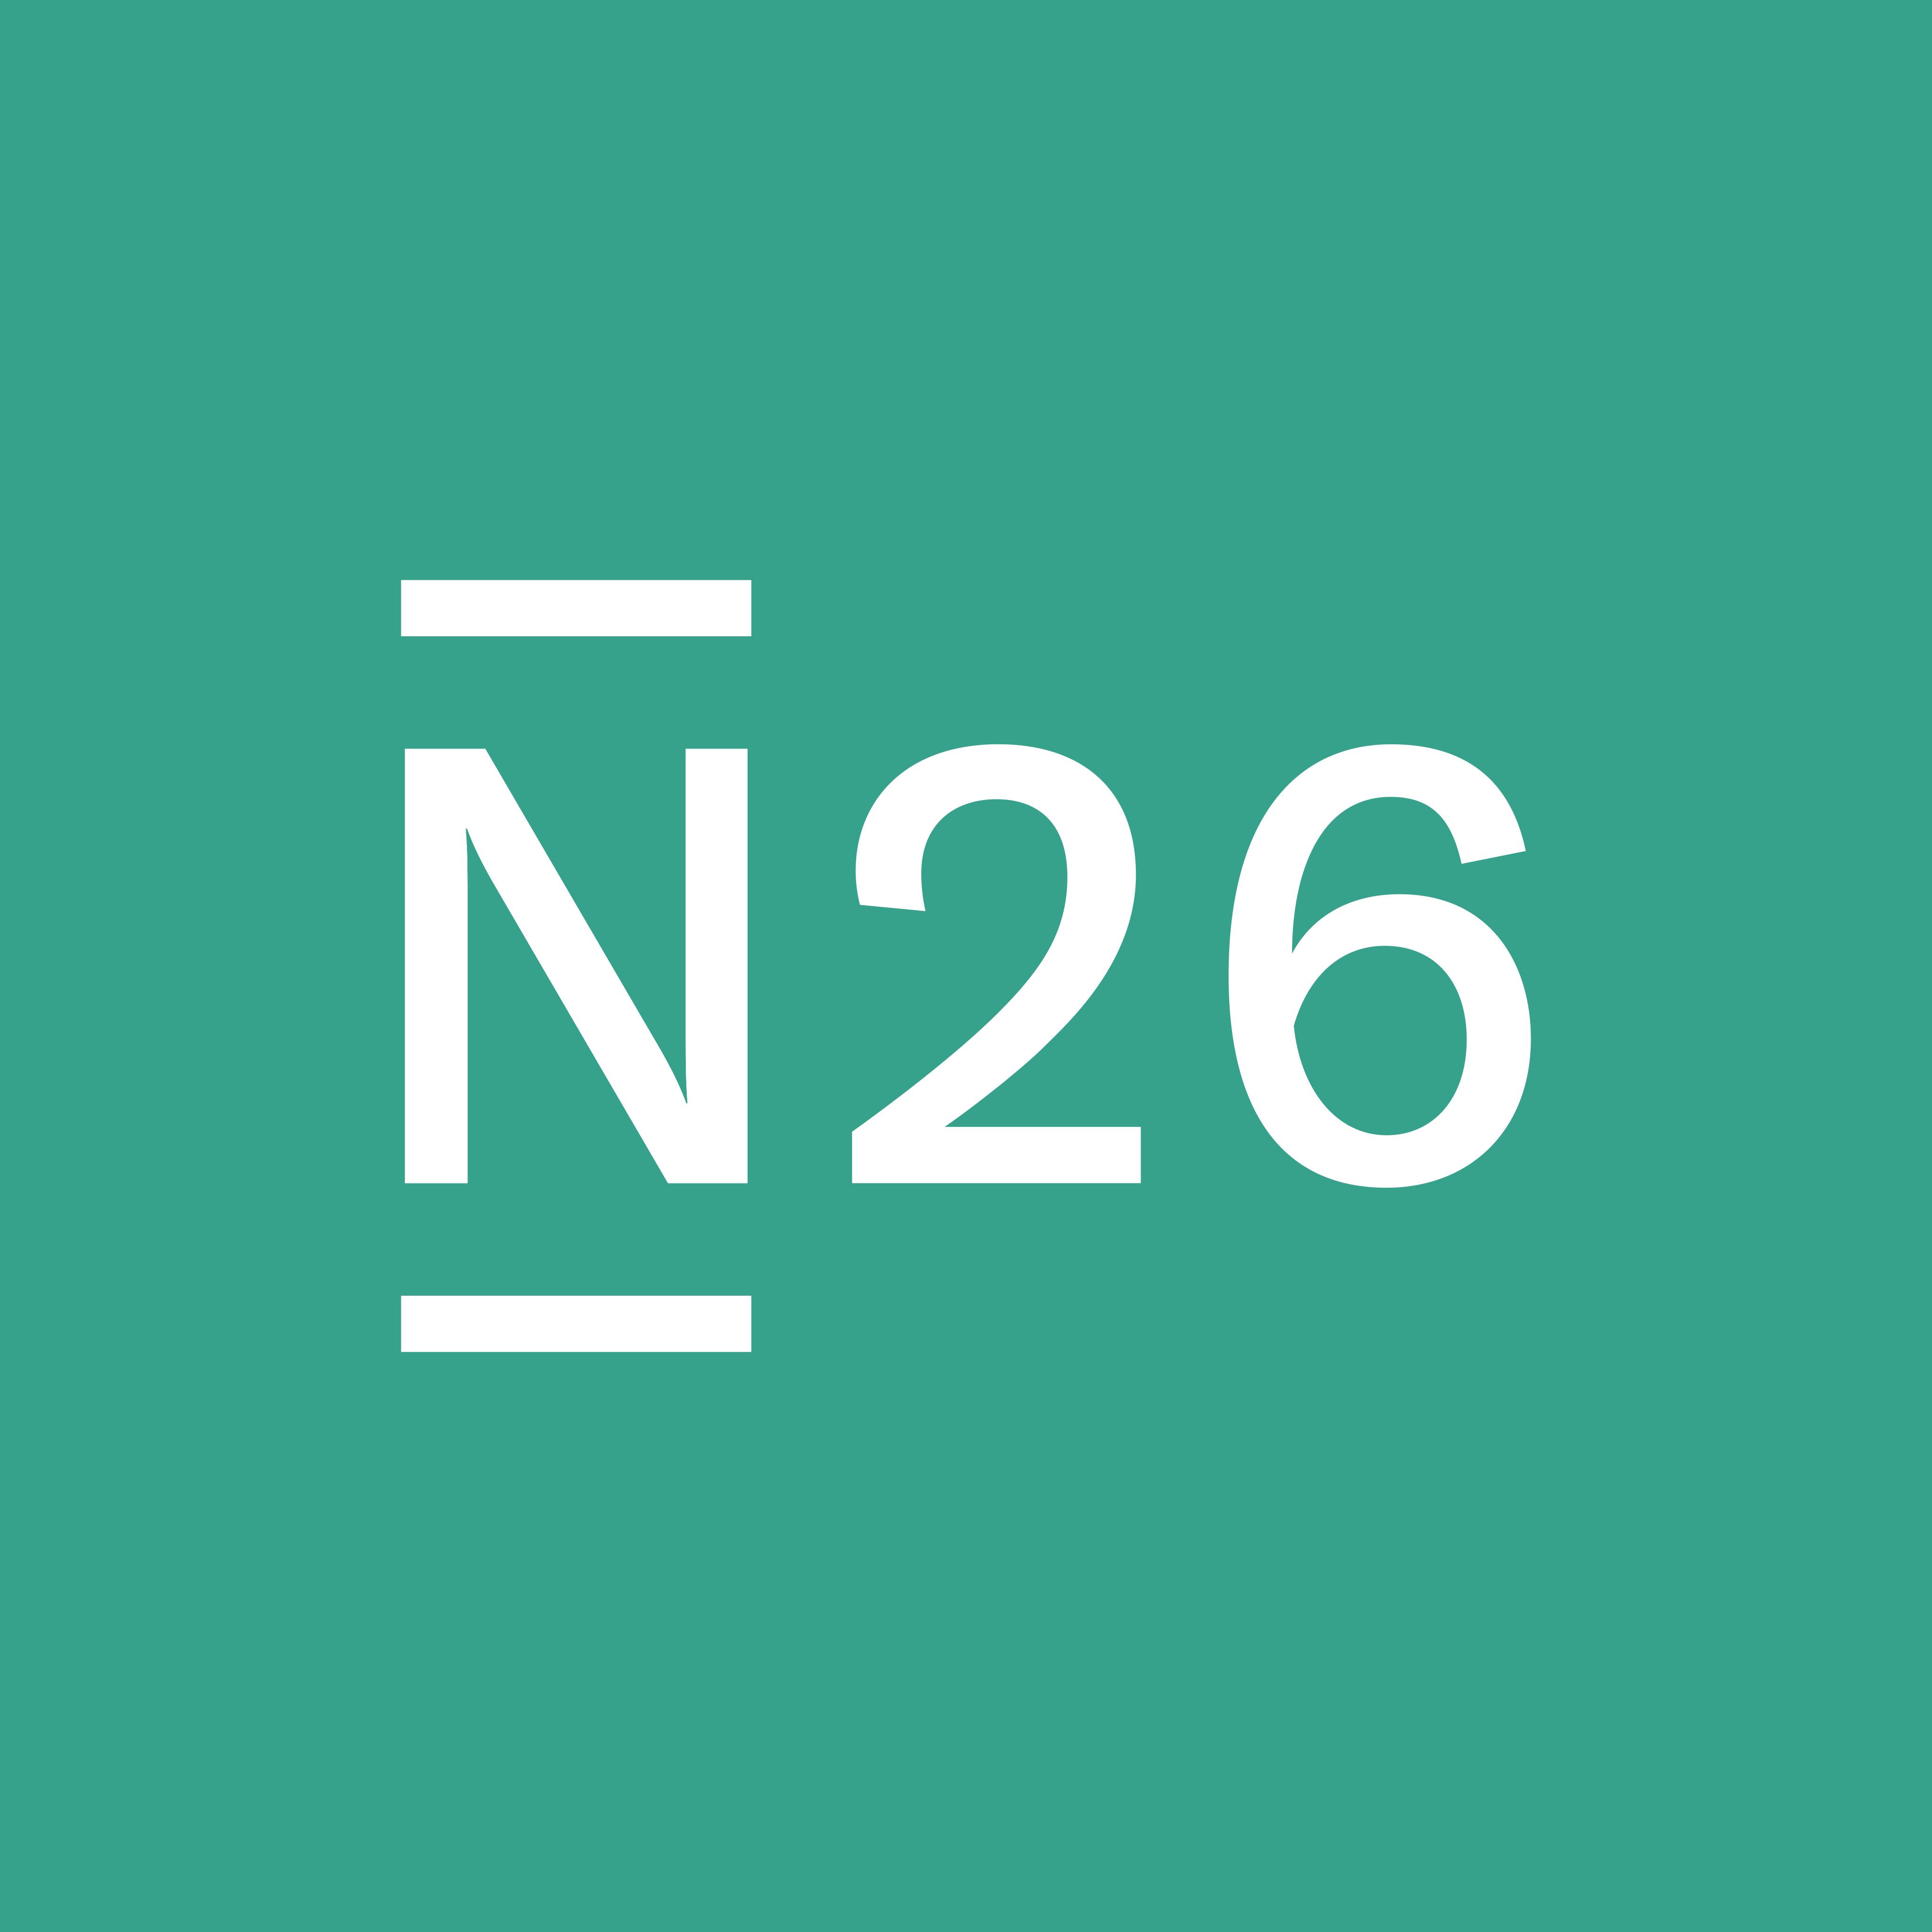 N26 Logo PNG.